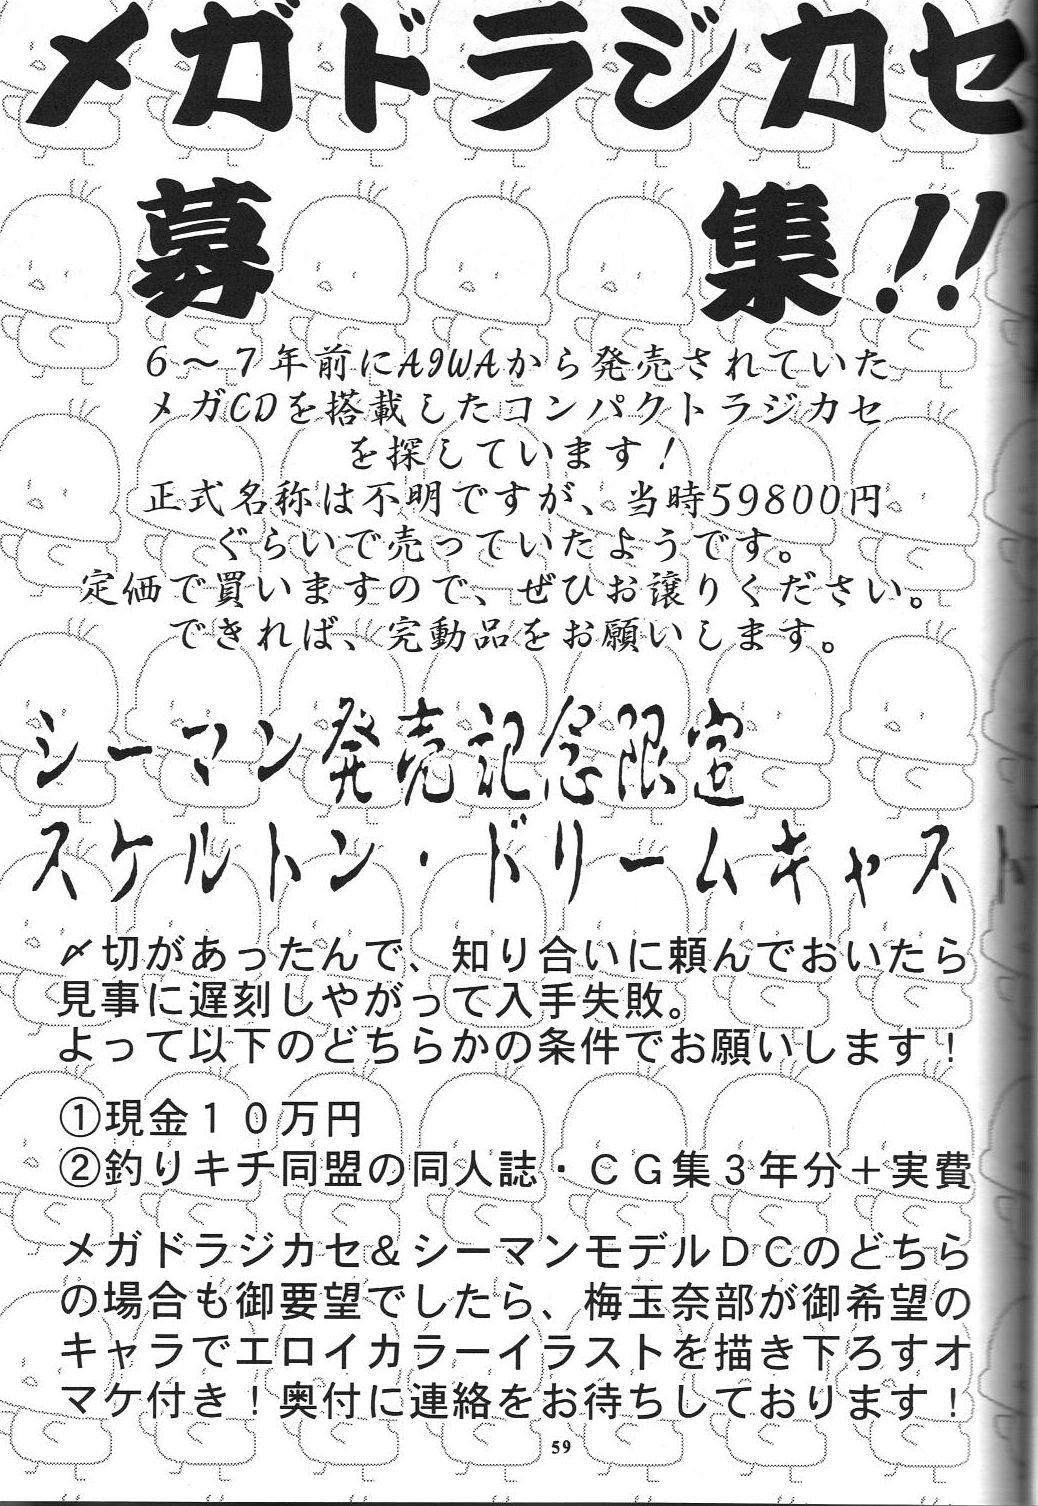 (C56) [Tsurikichi Doumei (Various)] Sengoku Rock - Nan Demo-R (Various) 59